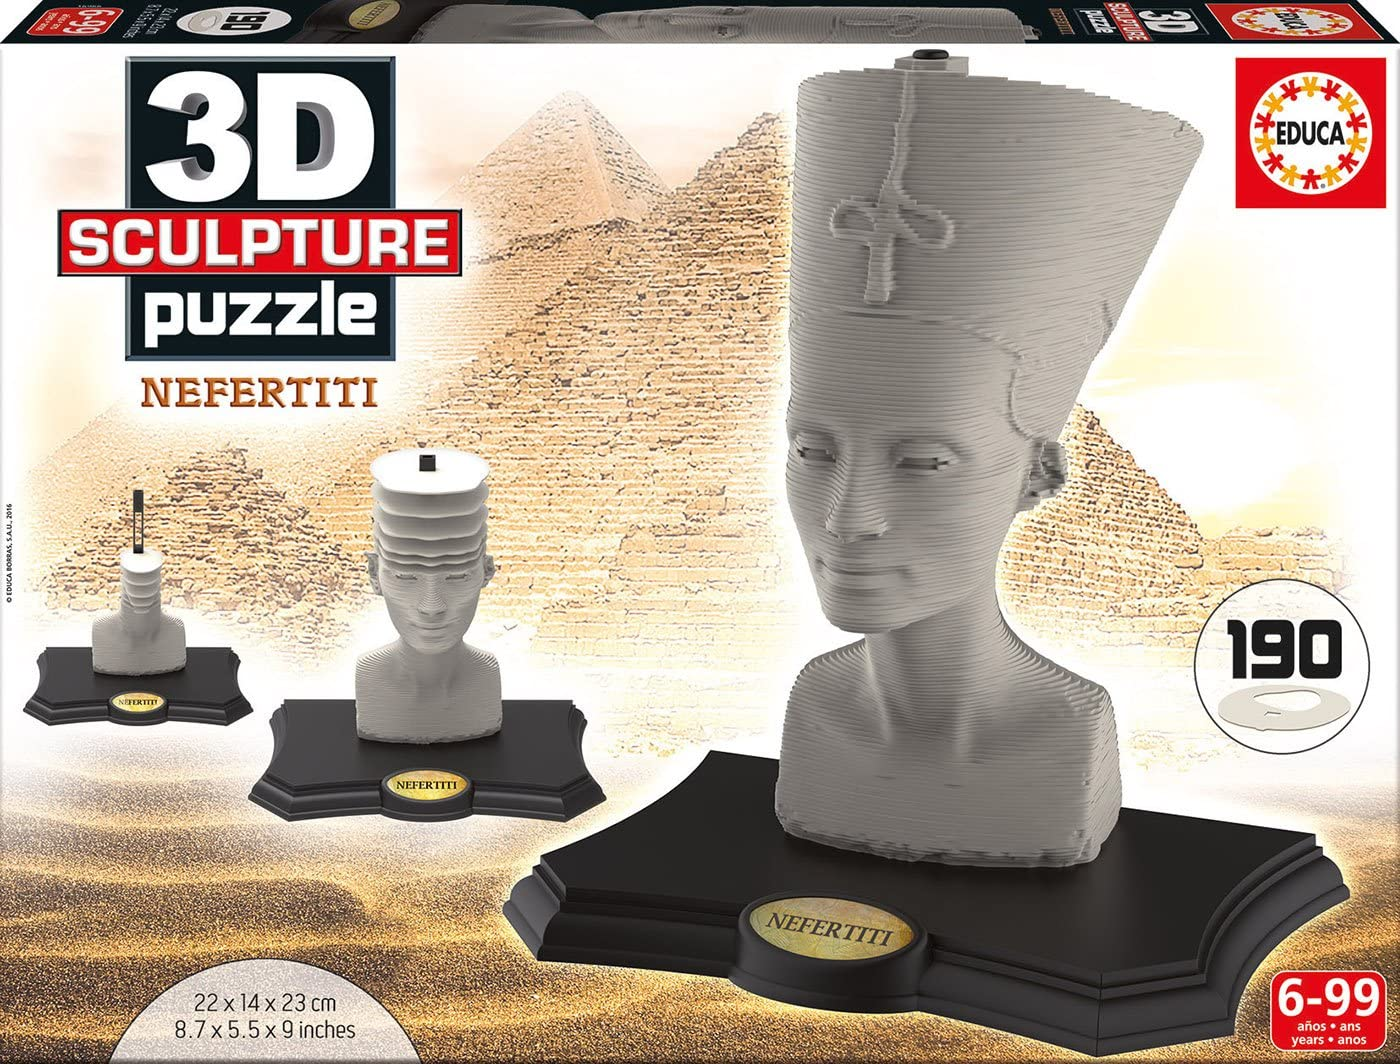 Educa Borrás - Nefertiti, Puzzle 3D Escultura (16966)